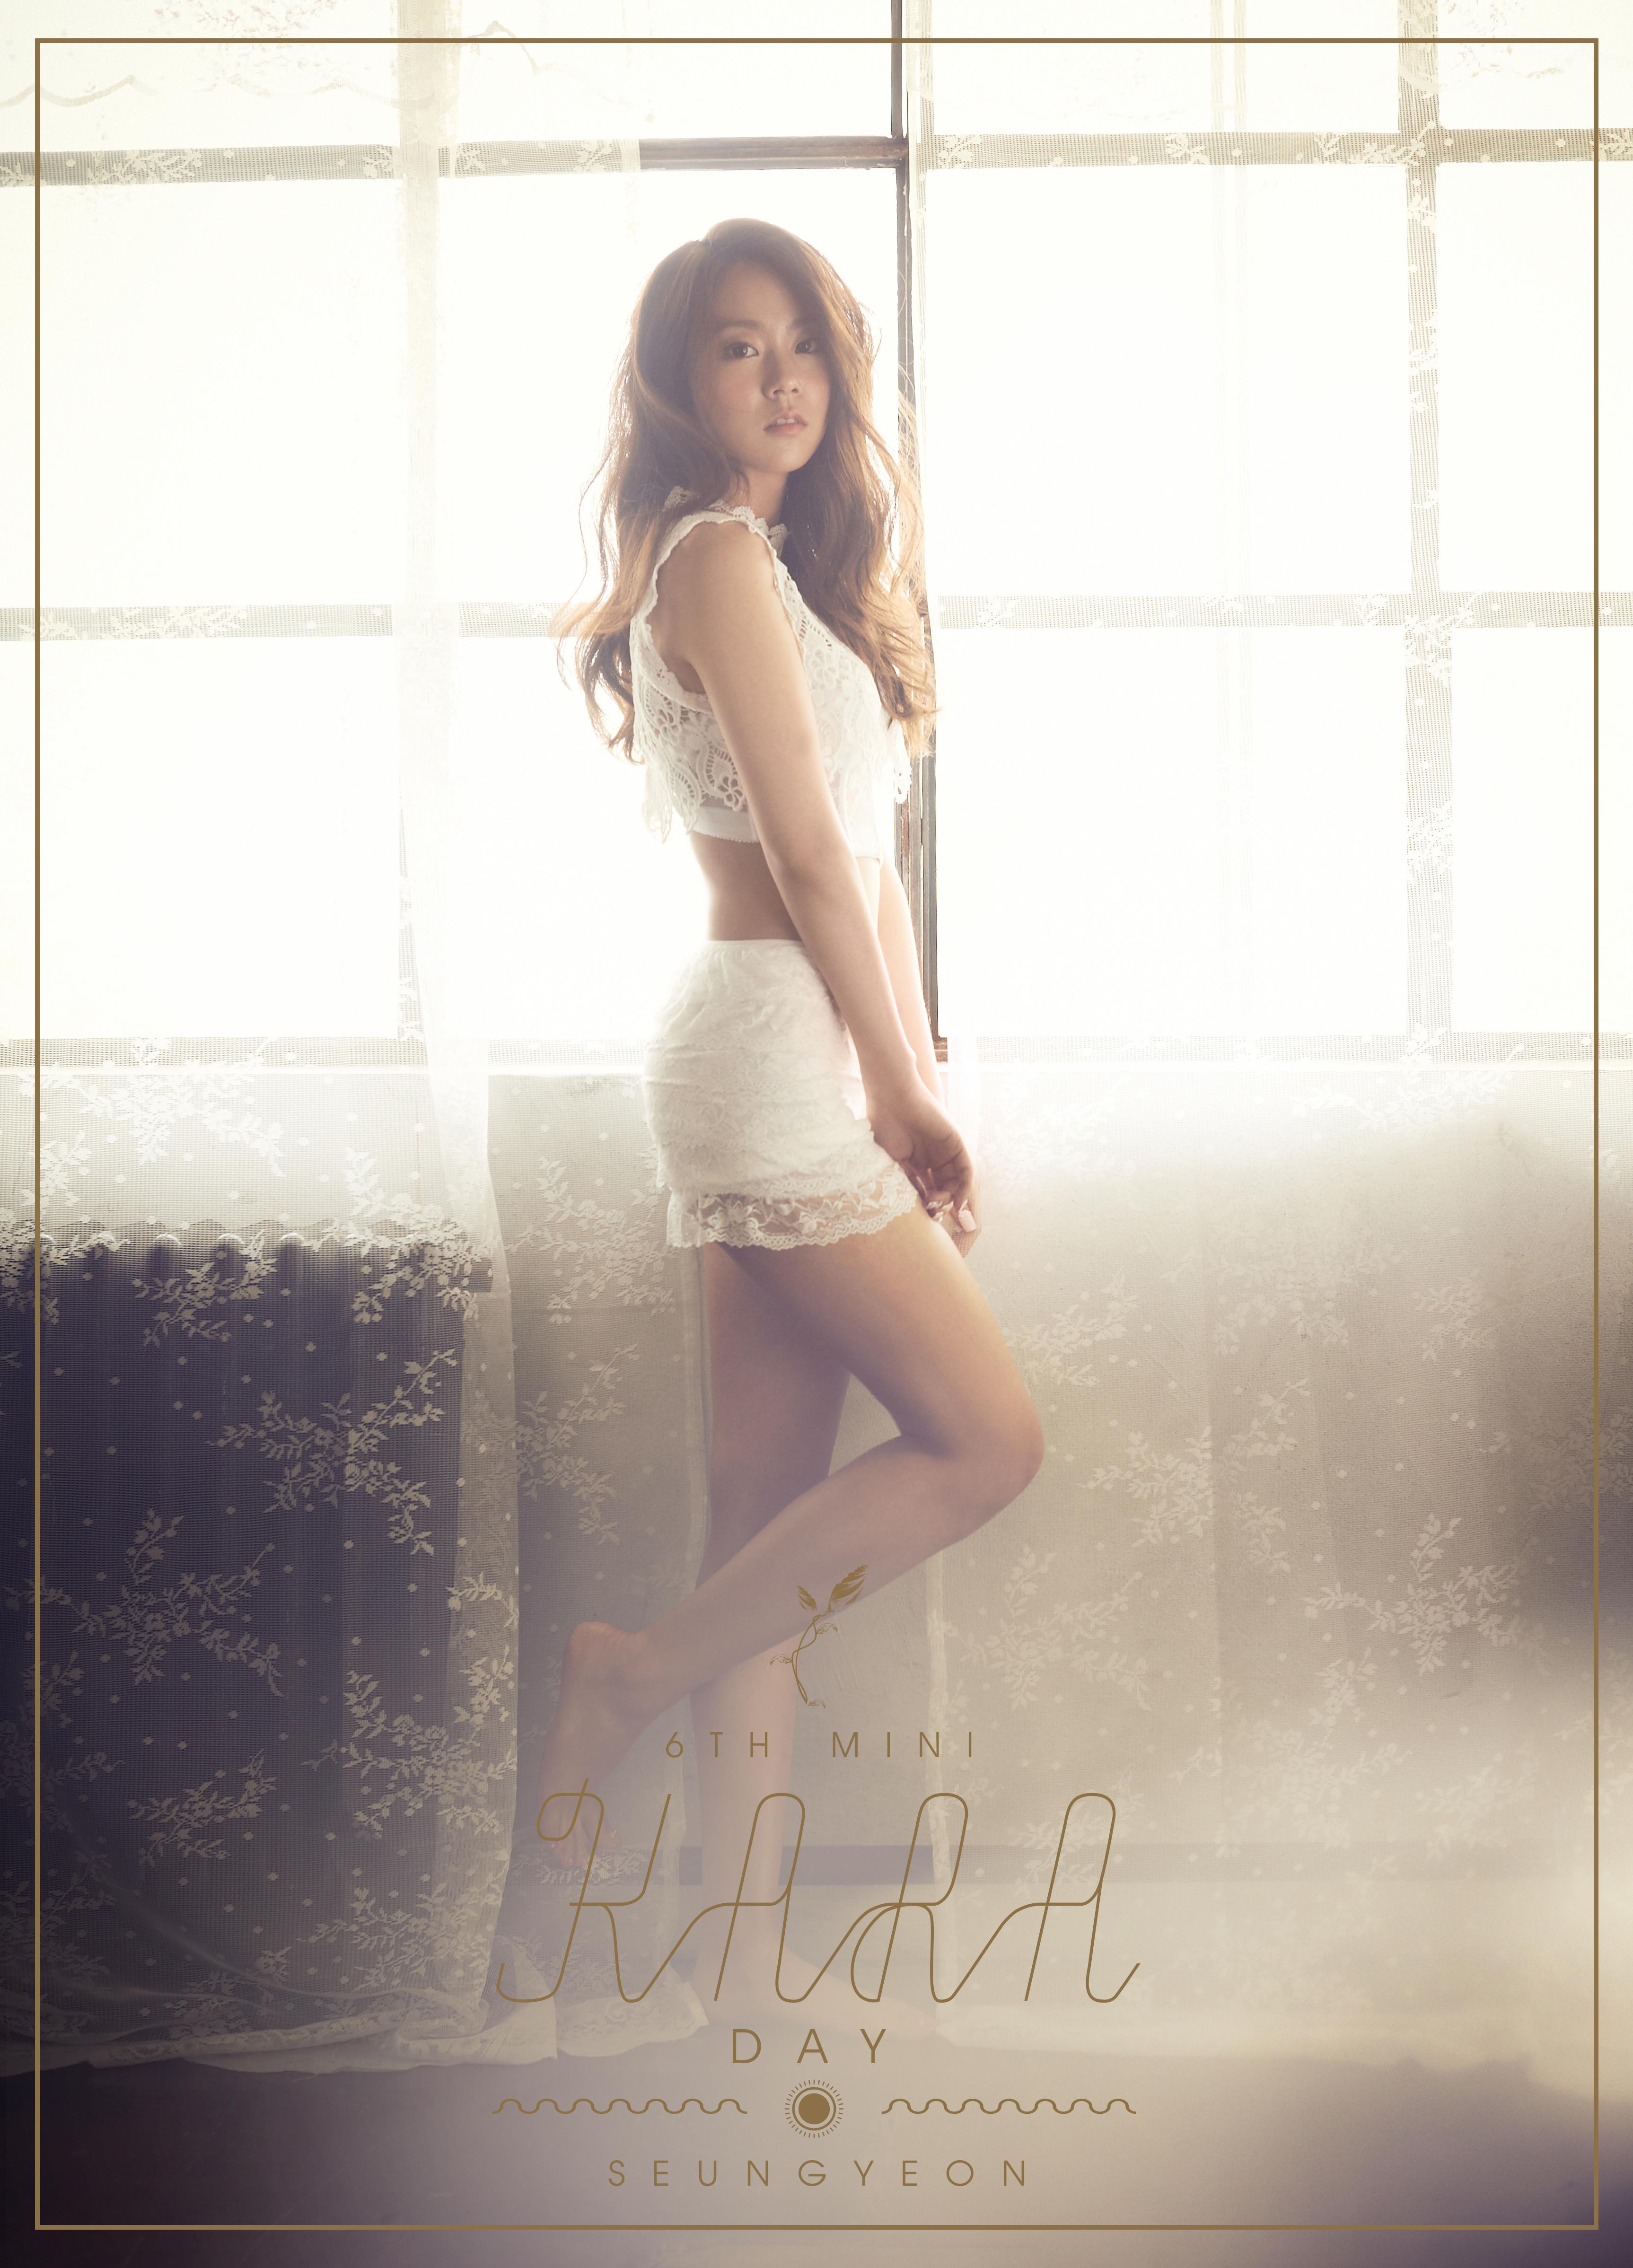 KARA Seungyeon 'Day & Night' Teaser HQ